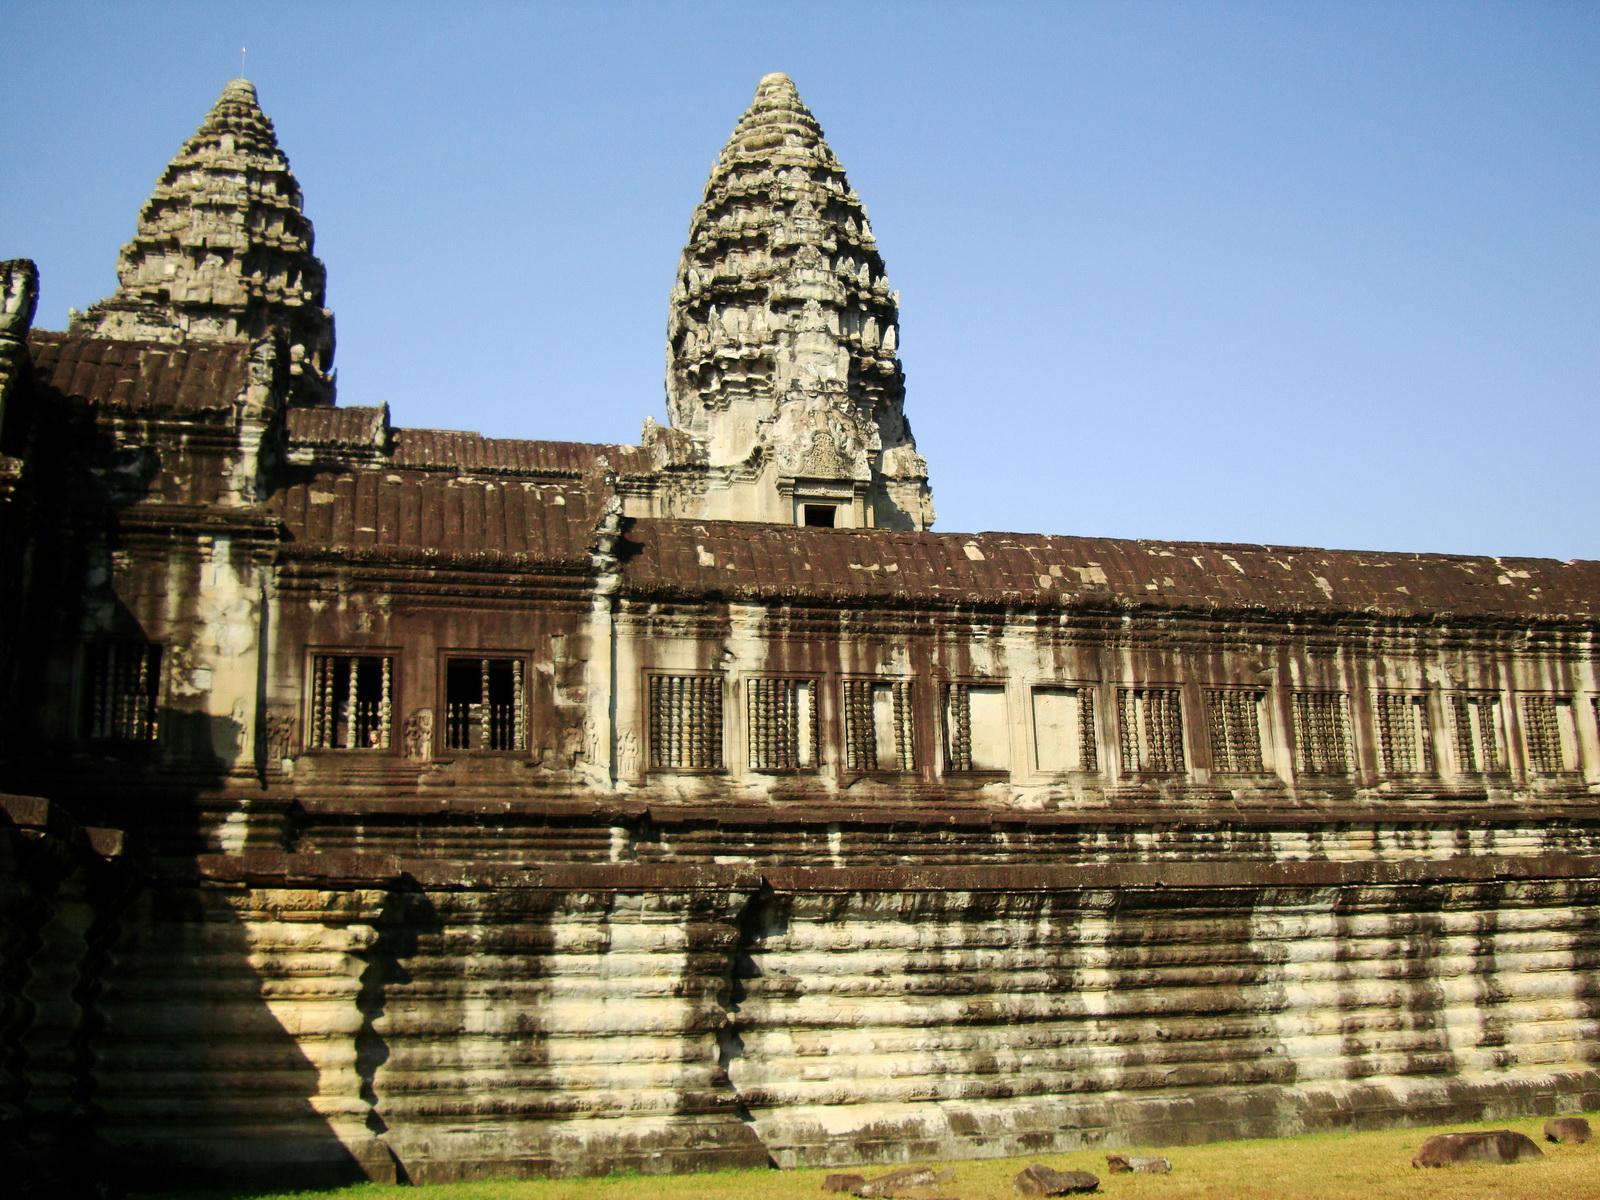 Angkor Wat Khmer architecture internal gallery E entrance 11